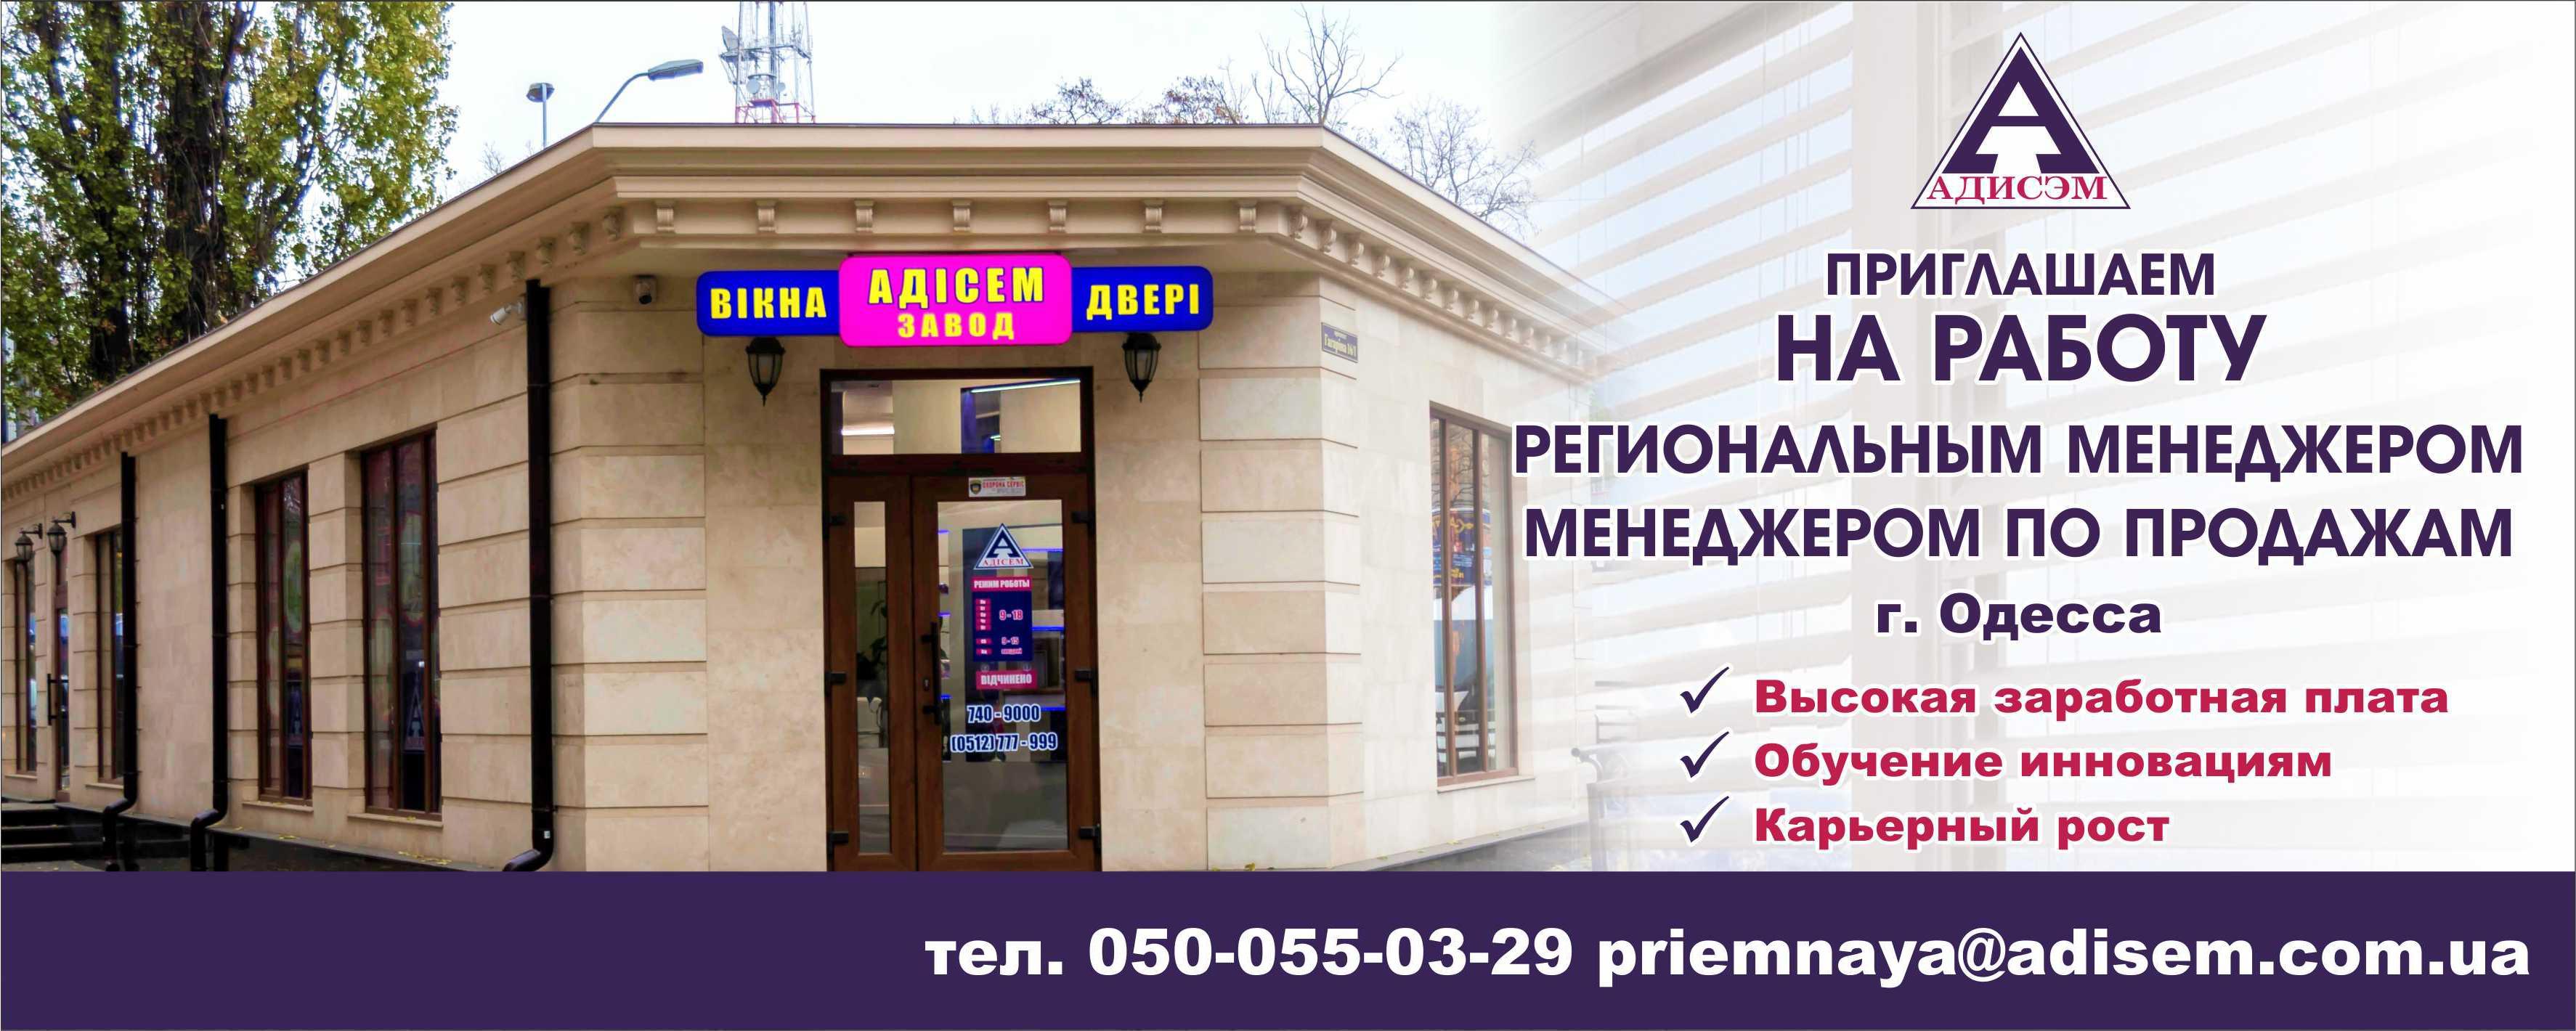 АДИСЭМ - пвх окна и двери в Николаеве, Херсоне и Одессе